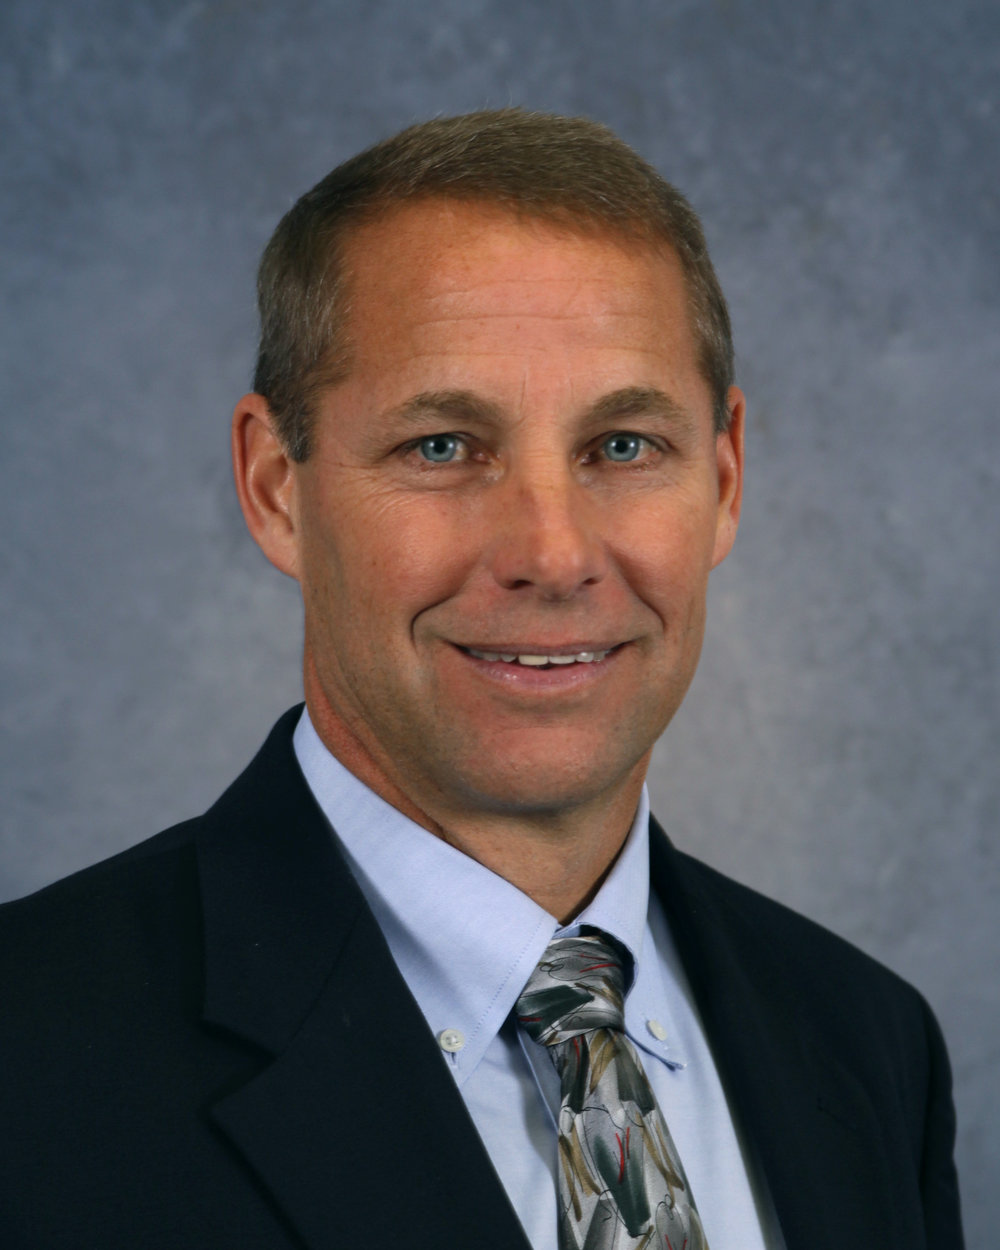 Glen Tellock <br> CEO <br> Lakeside Foods